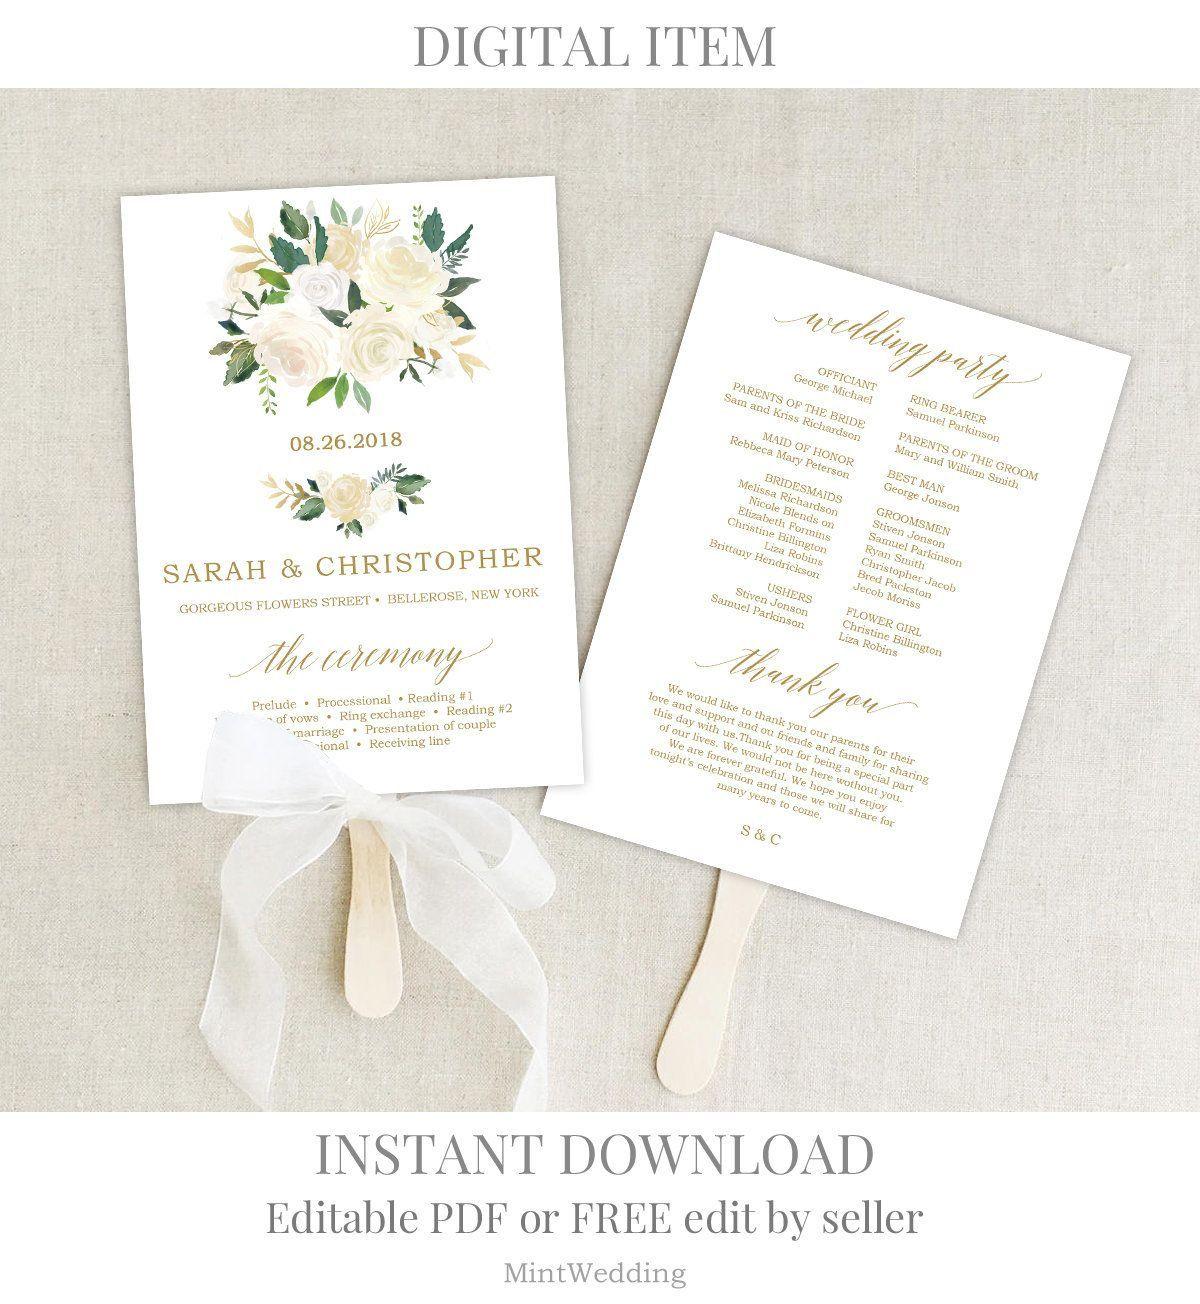 001 Impressive Free Wedding Program Fan Template High Def  Templates Printable Paddle WordFull